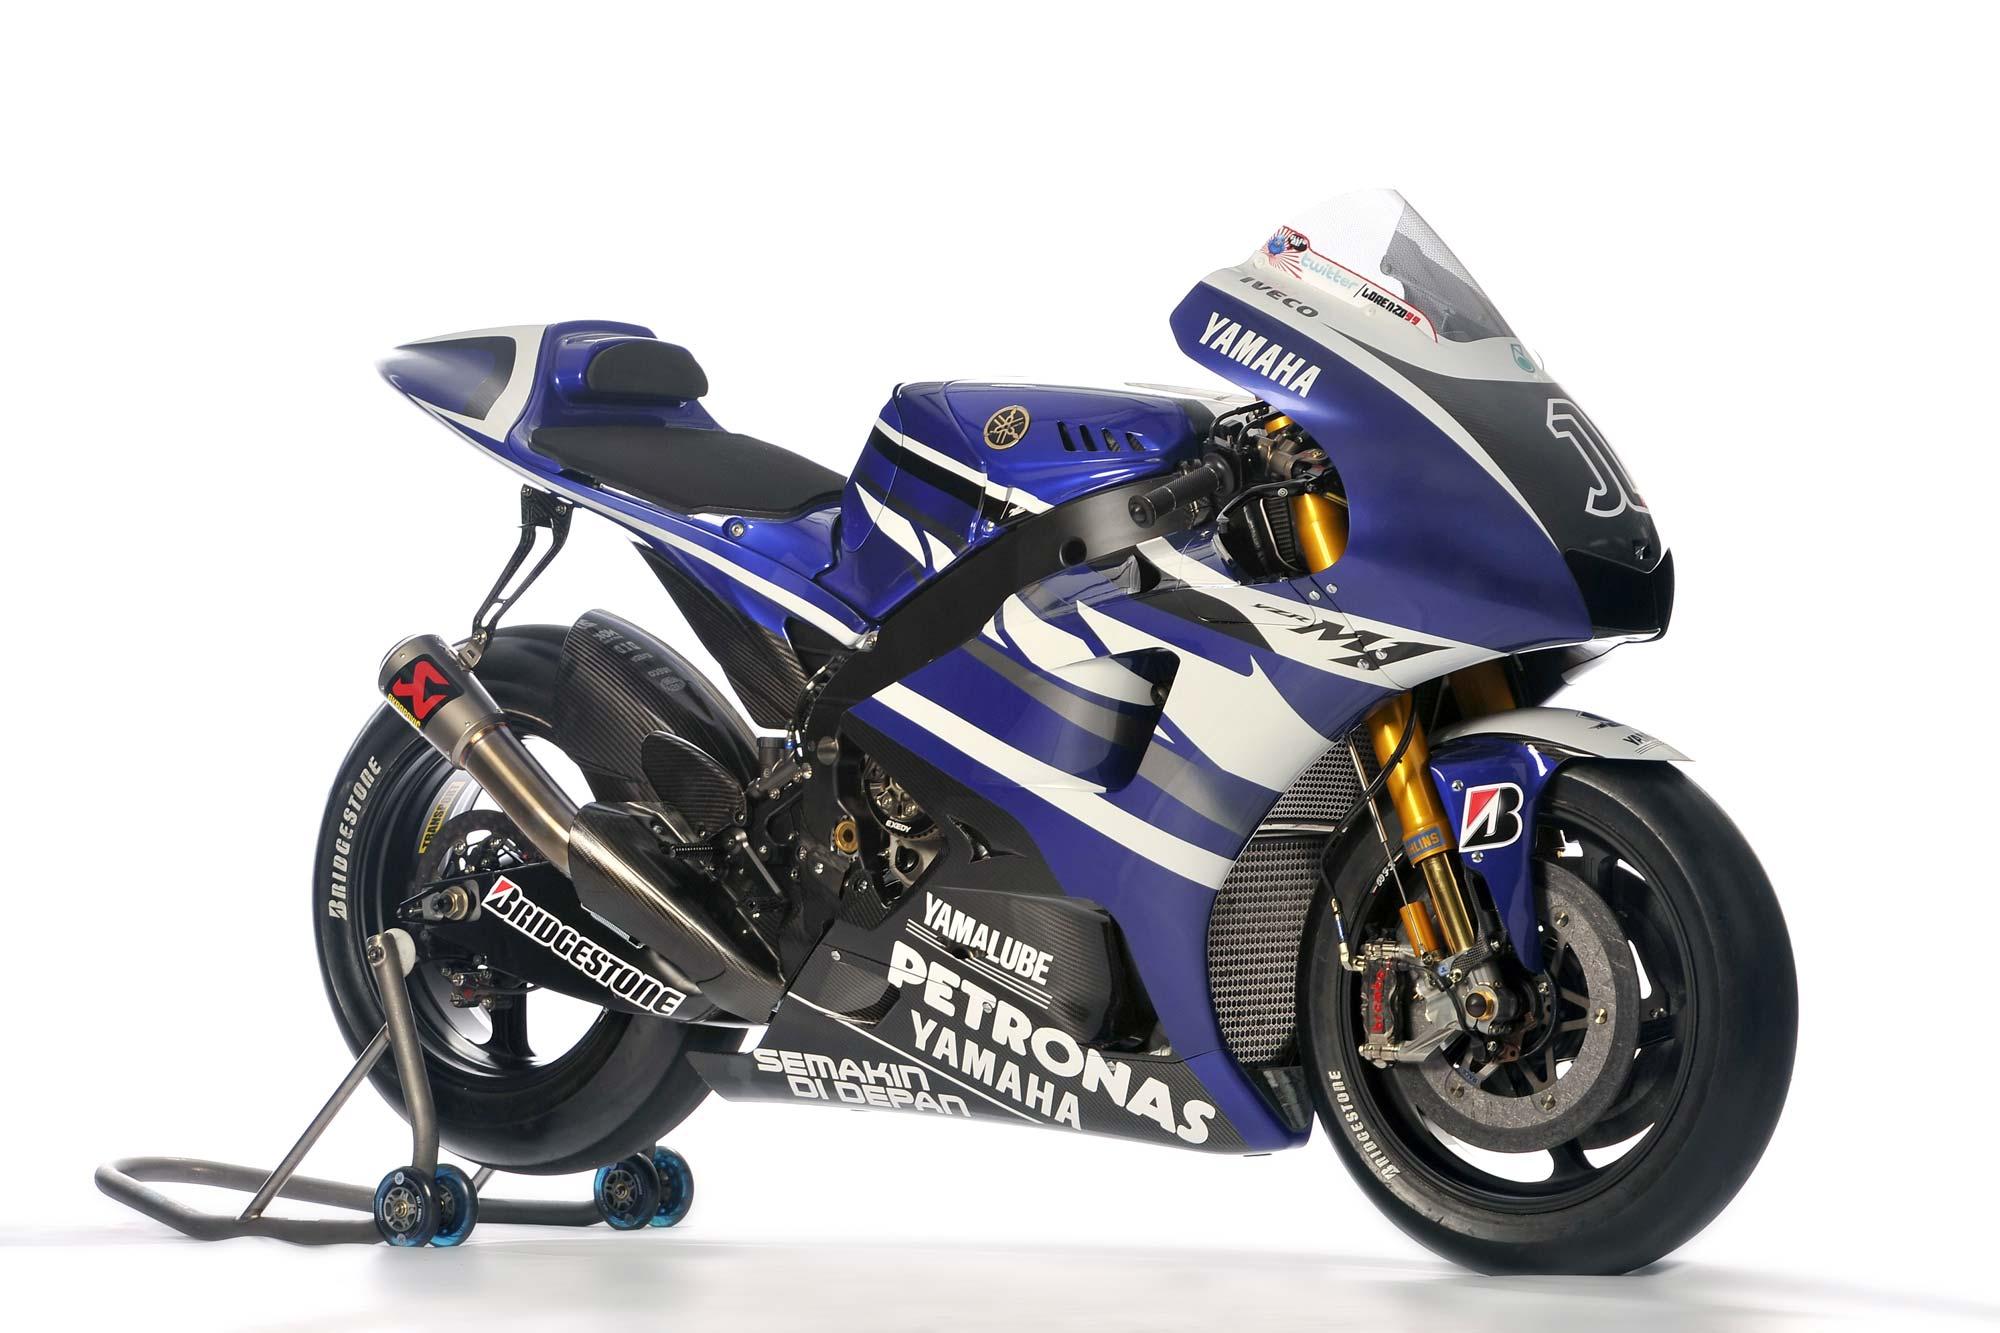 2011 Yamaha YZR-M1 Technical Specifications - Asphalt & Rubber